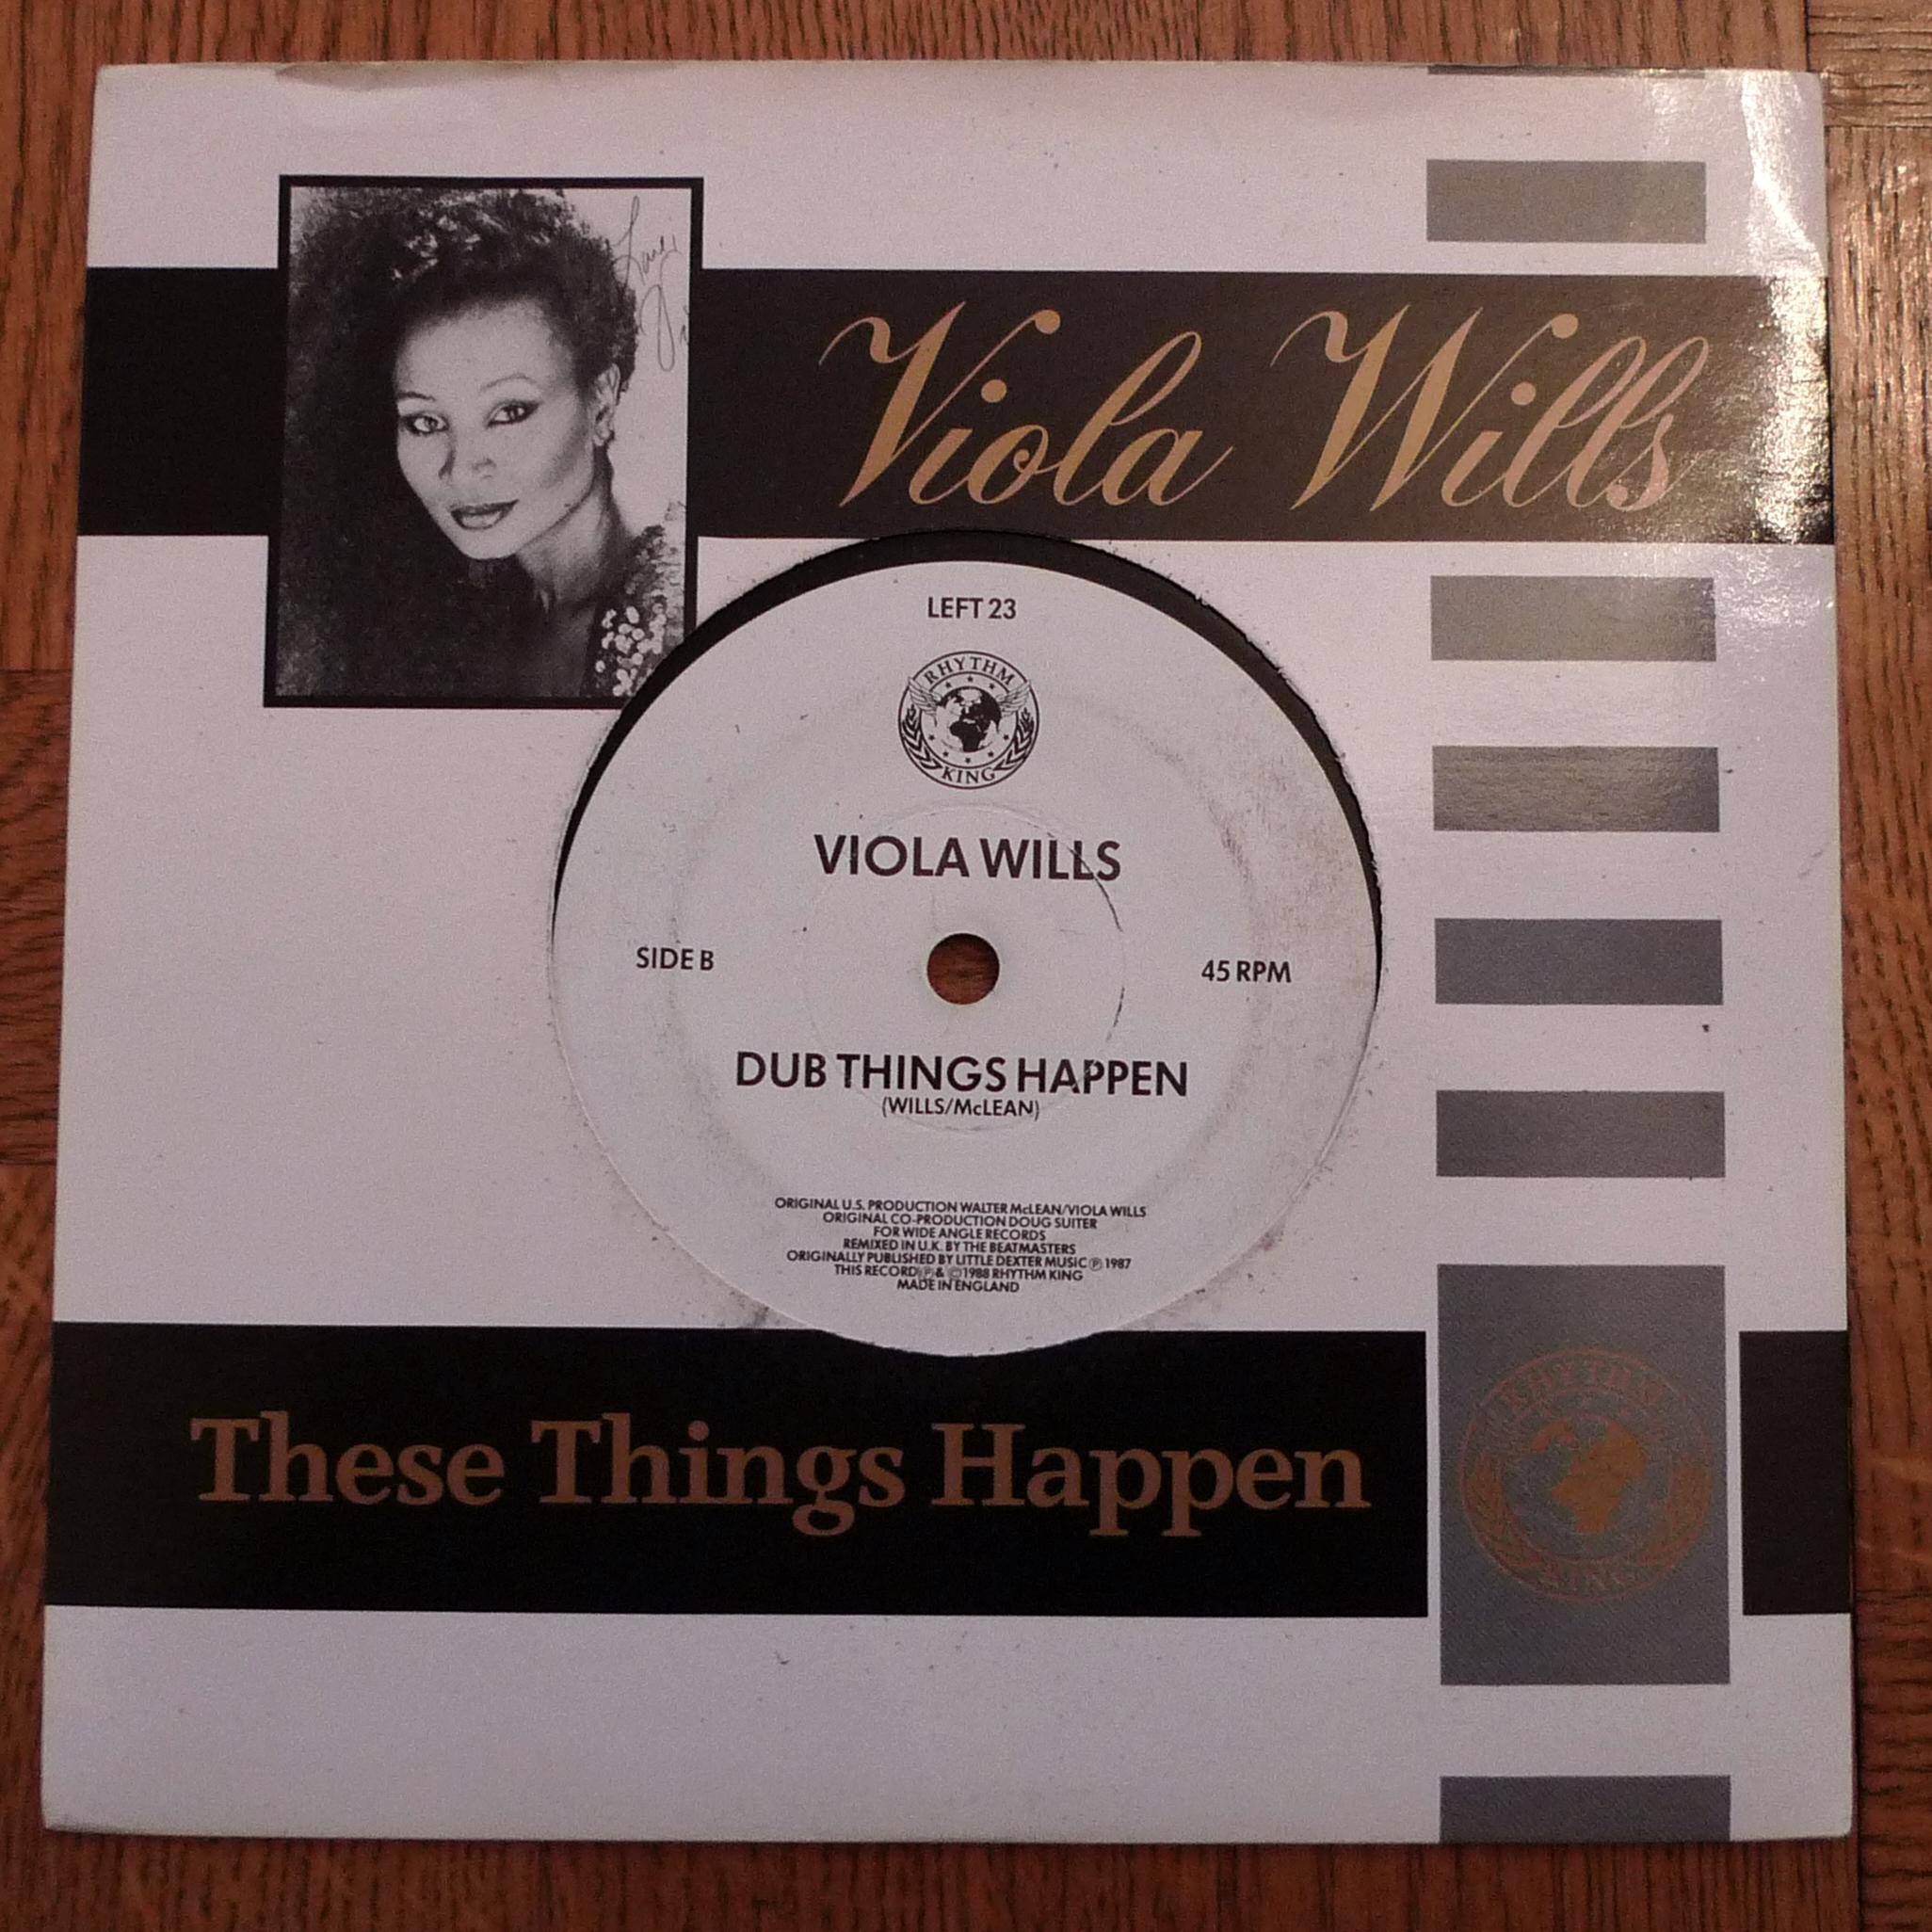 dj50s ep034 sleeve viola wills